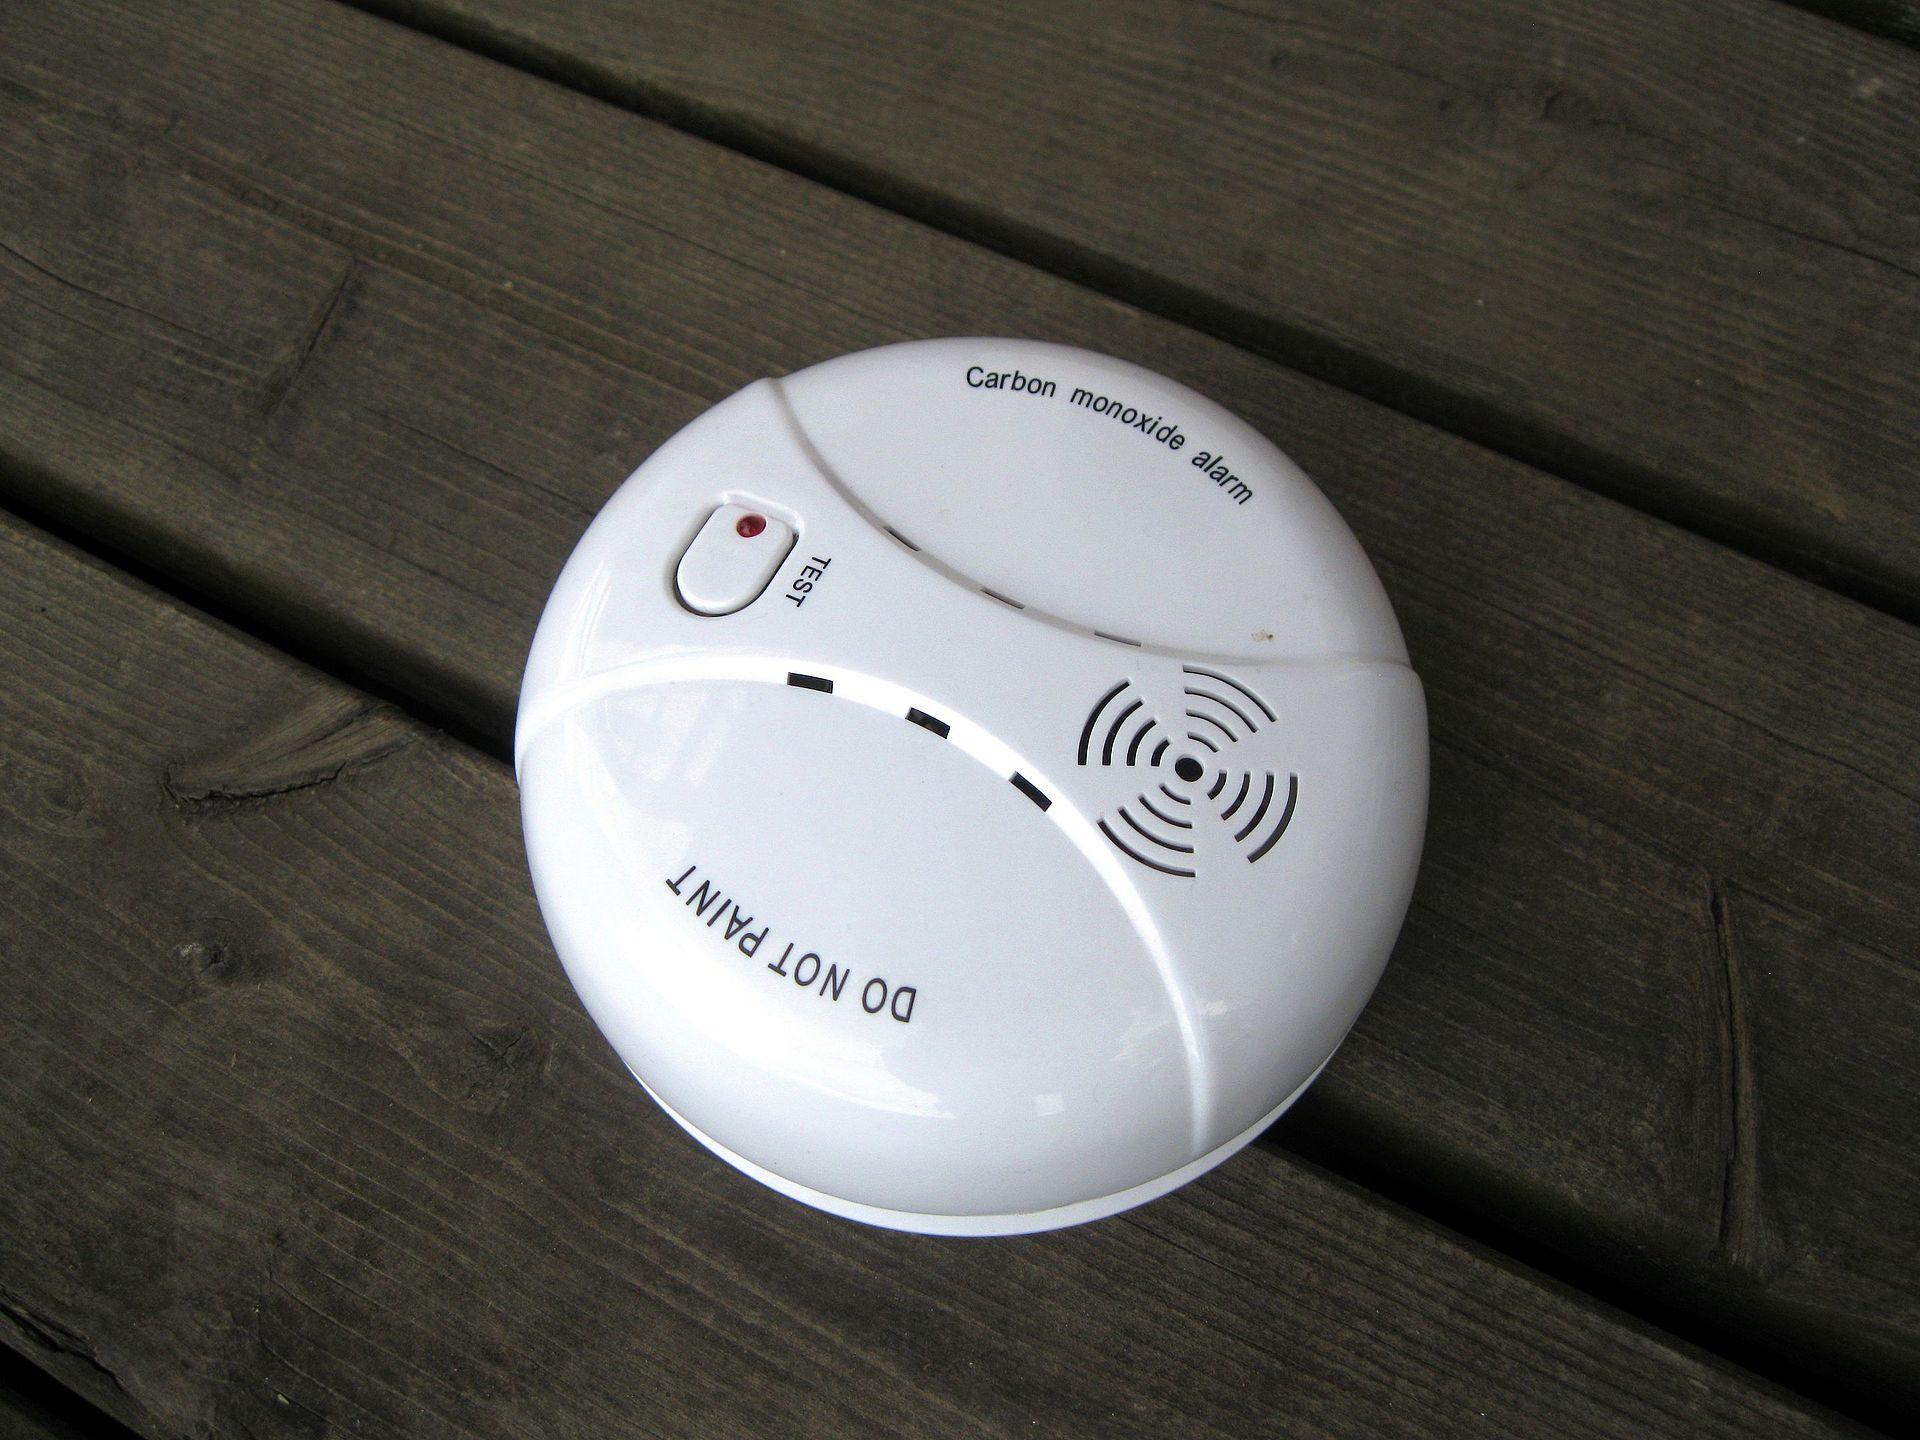 Security Alarm System Wiki